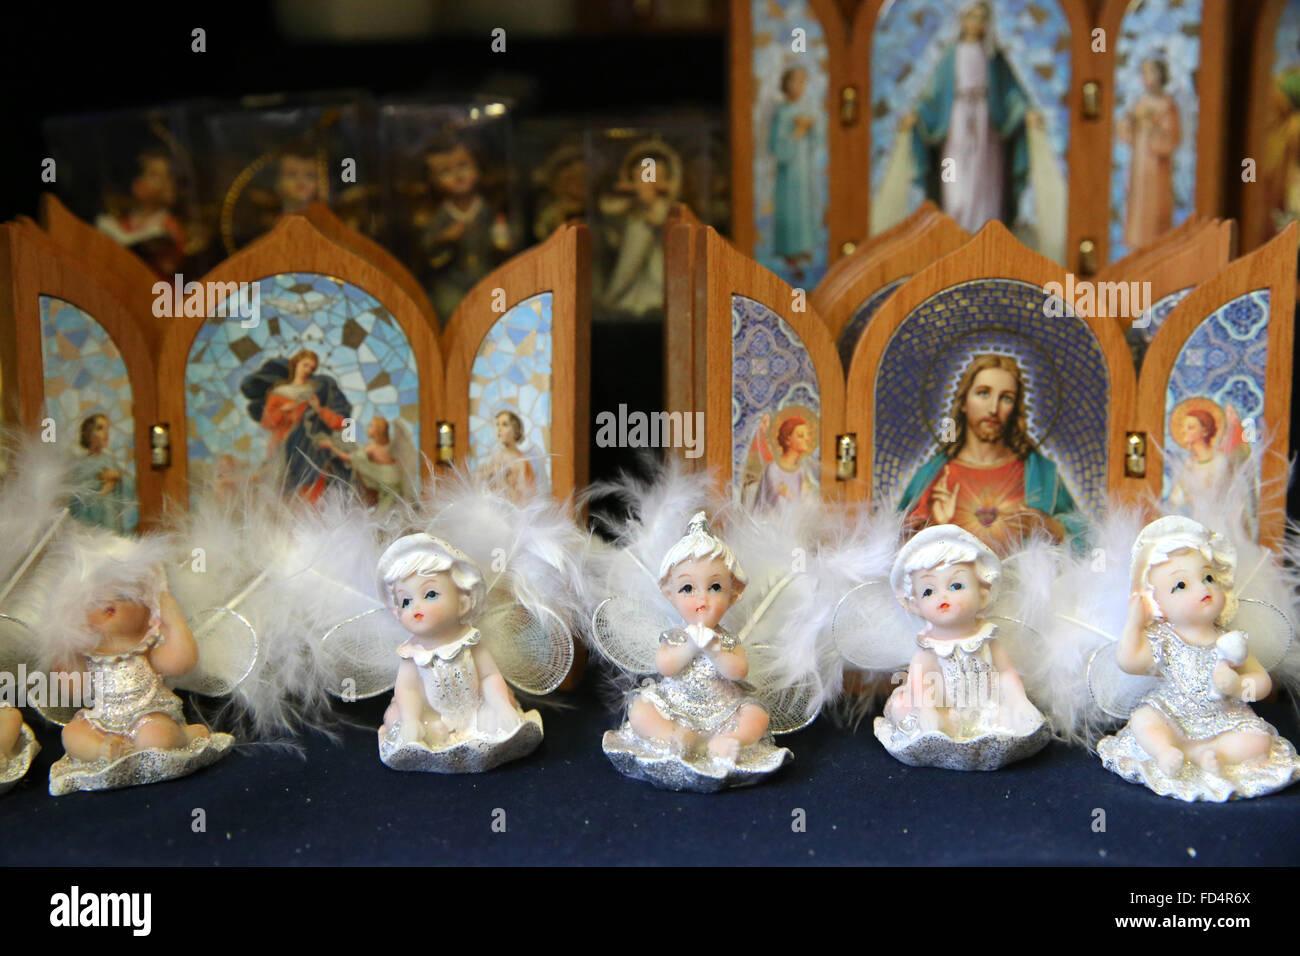 Katholischen Glauben Store. Religiöse Artikel. Engel. Stockbild